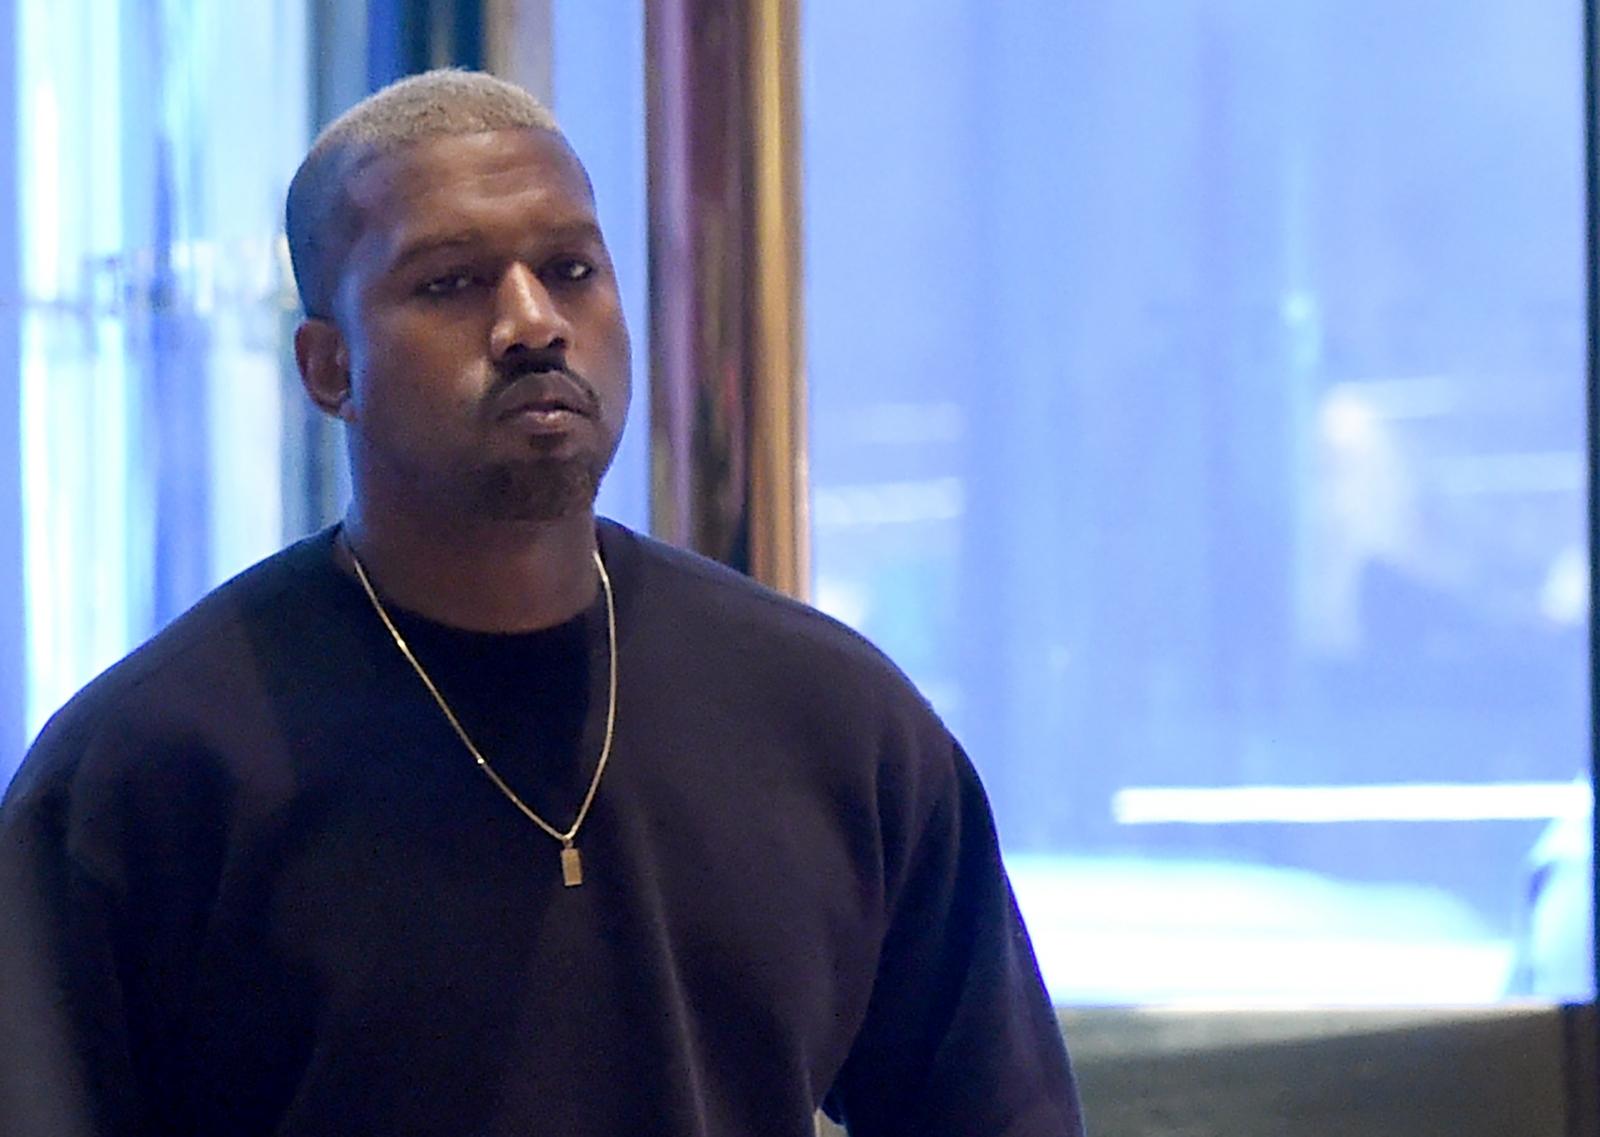 Kanye West Has Big Plans for 2017